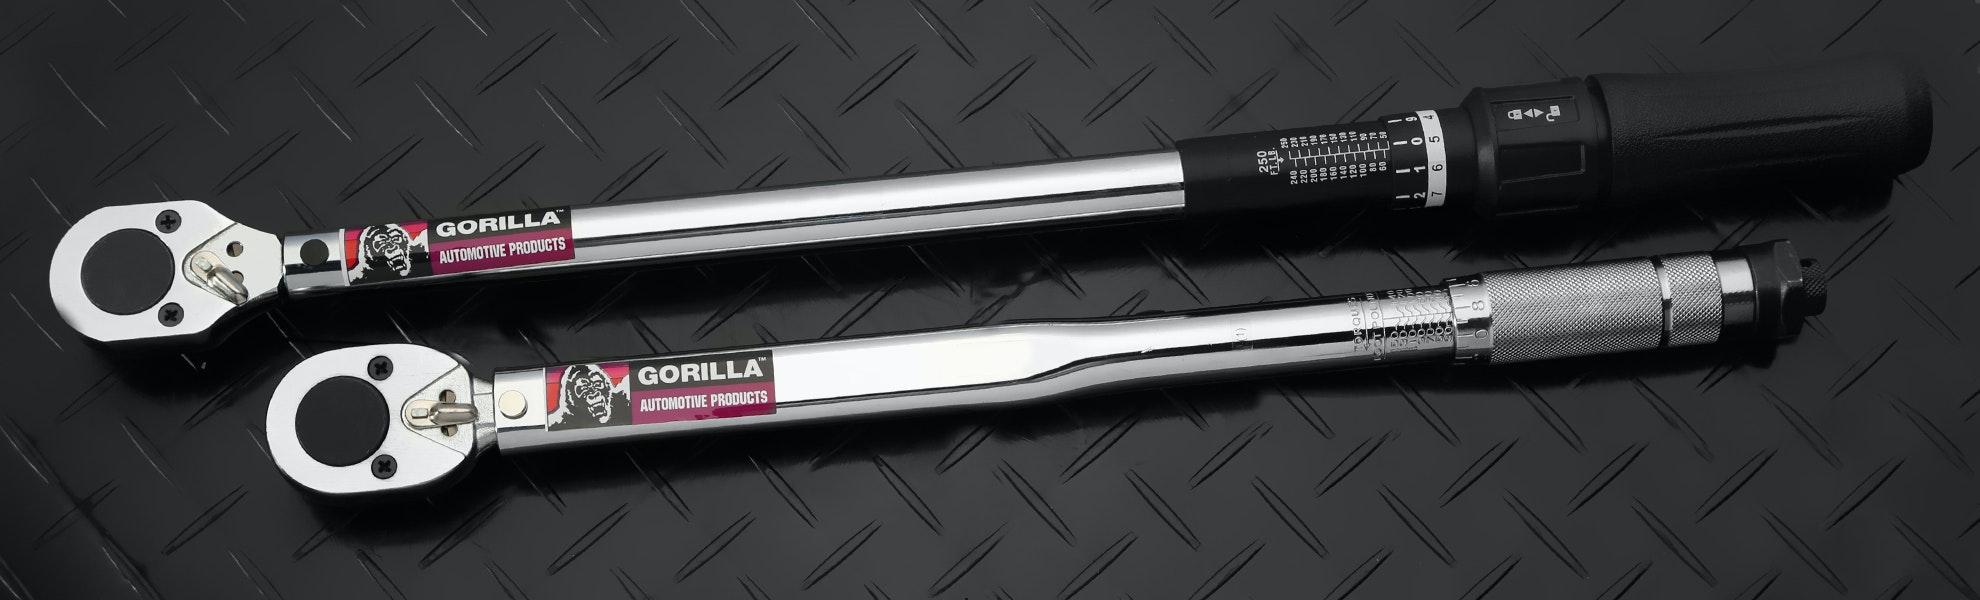 Gorilla Adjustable Torque Wrench